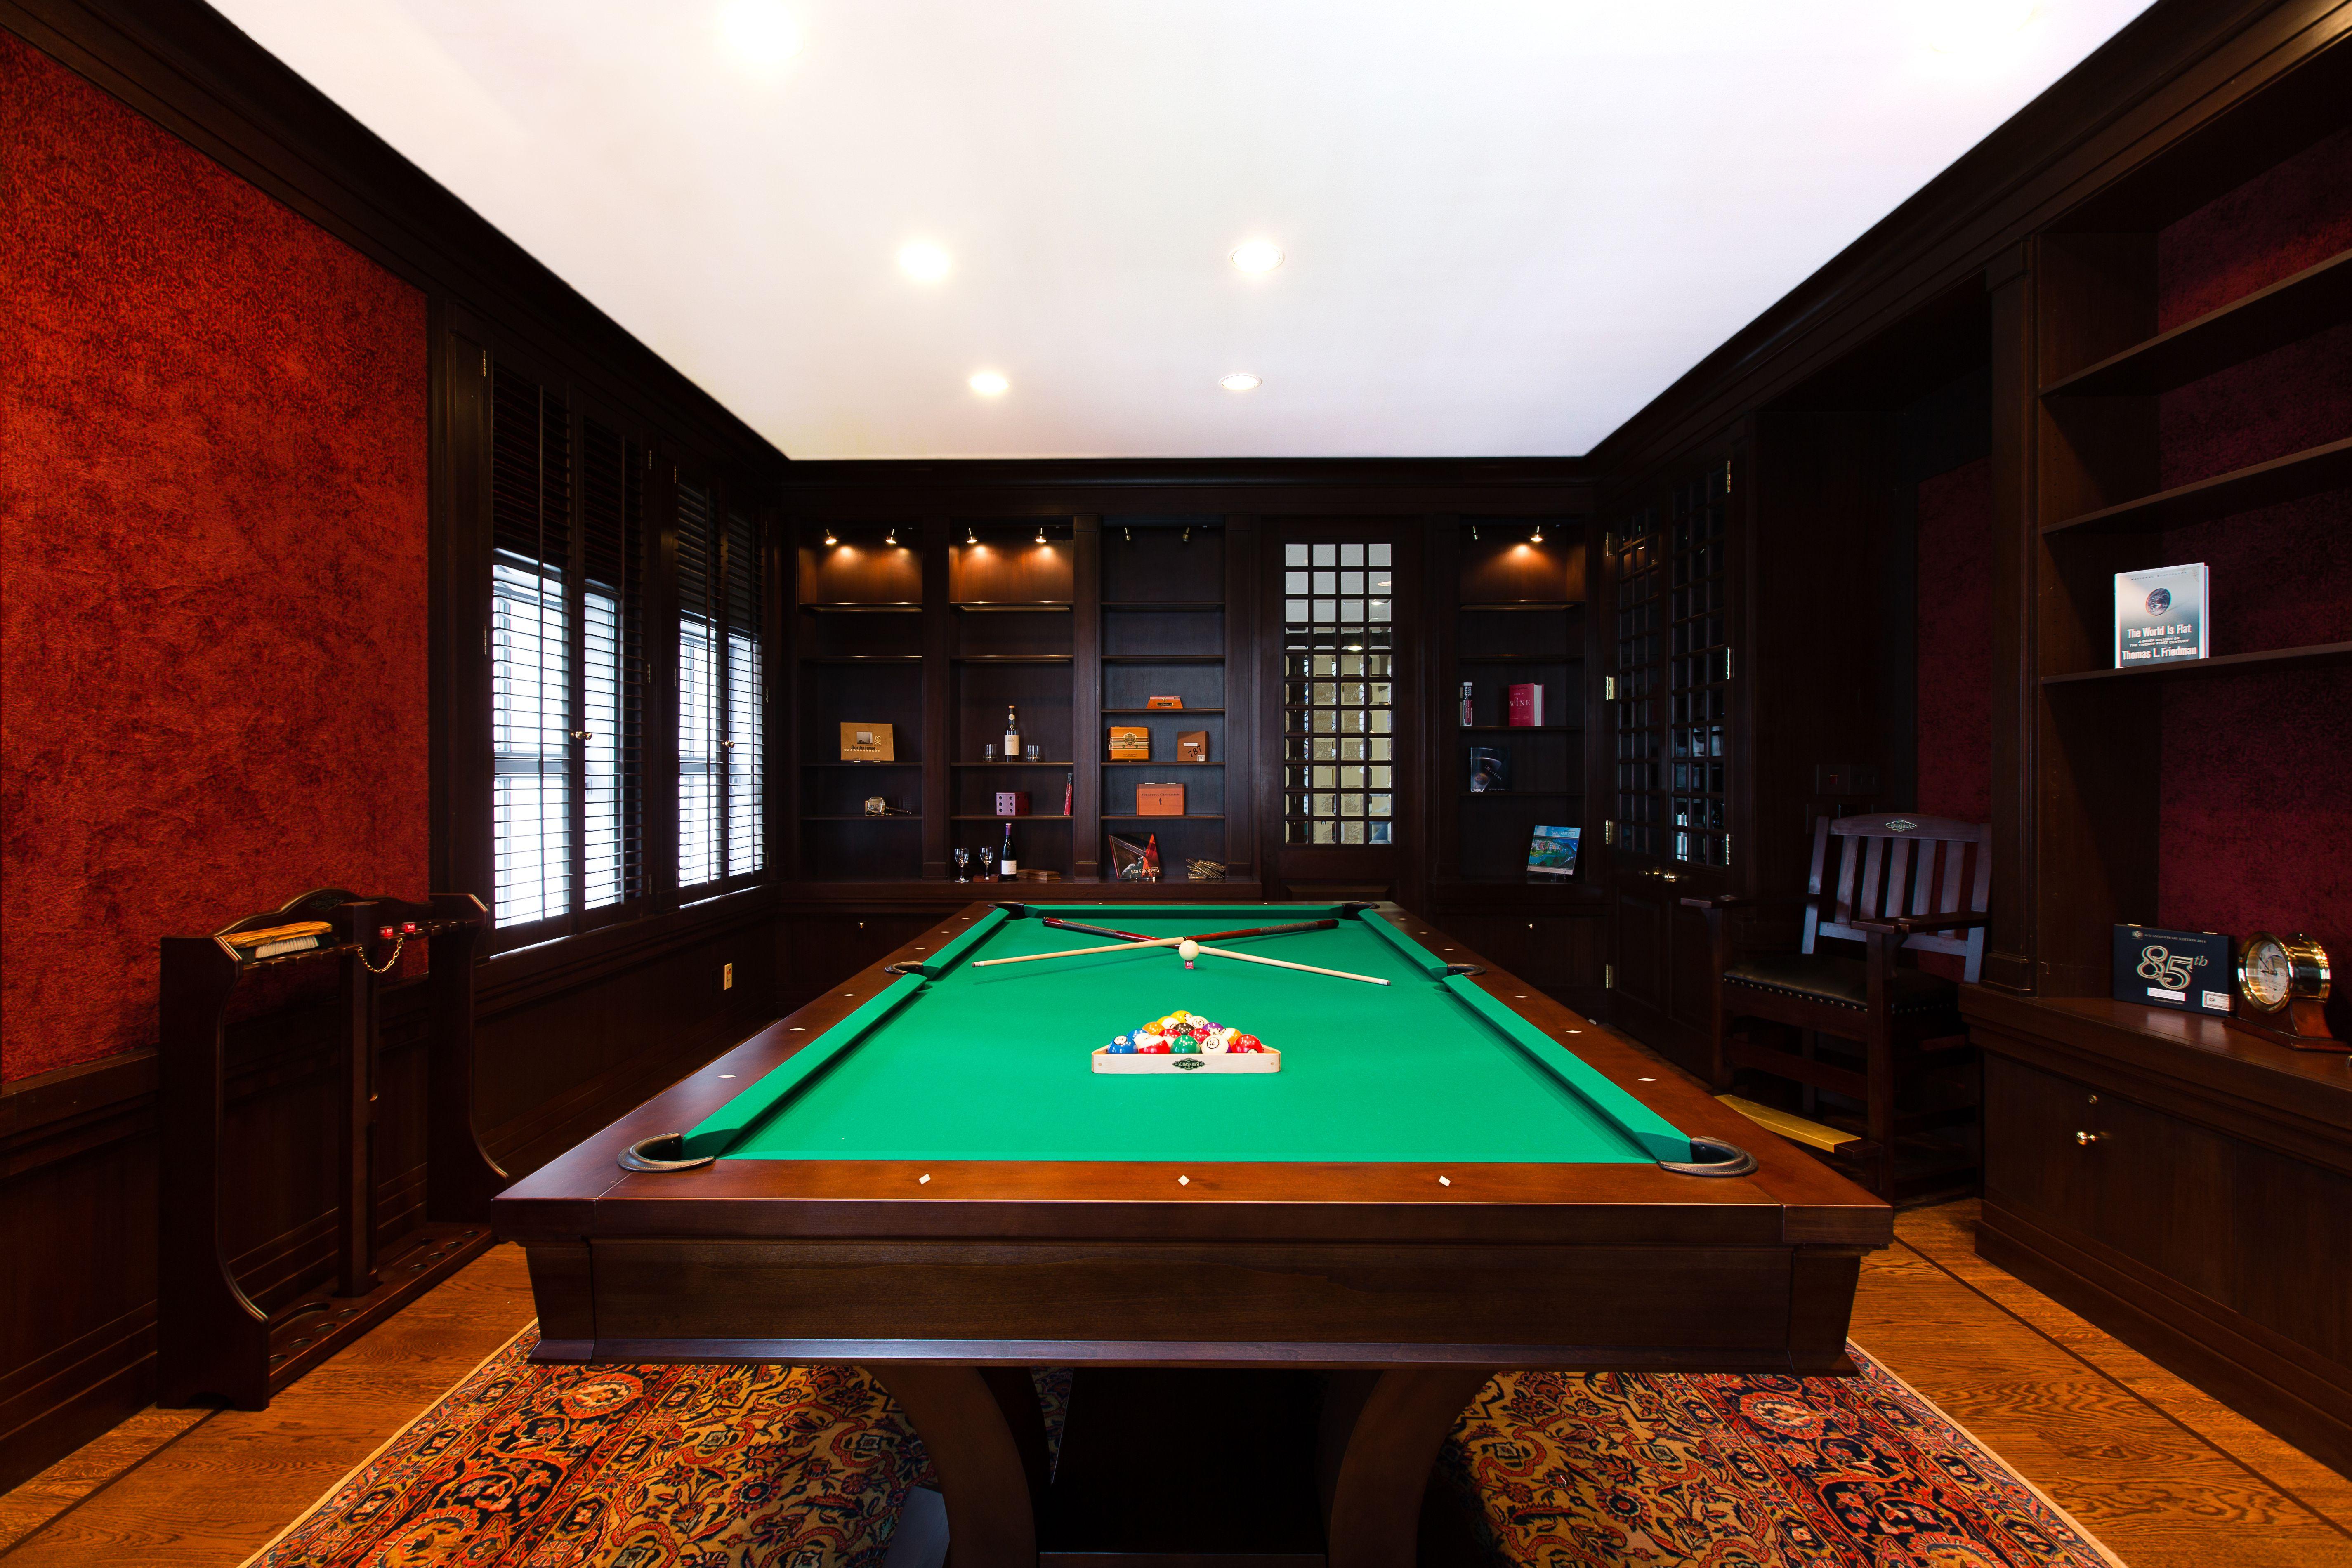 Work In Progress The New Billiards Room Billiard Room Billiards Snooker Table